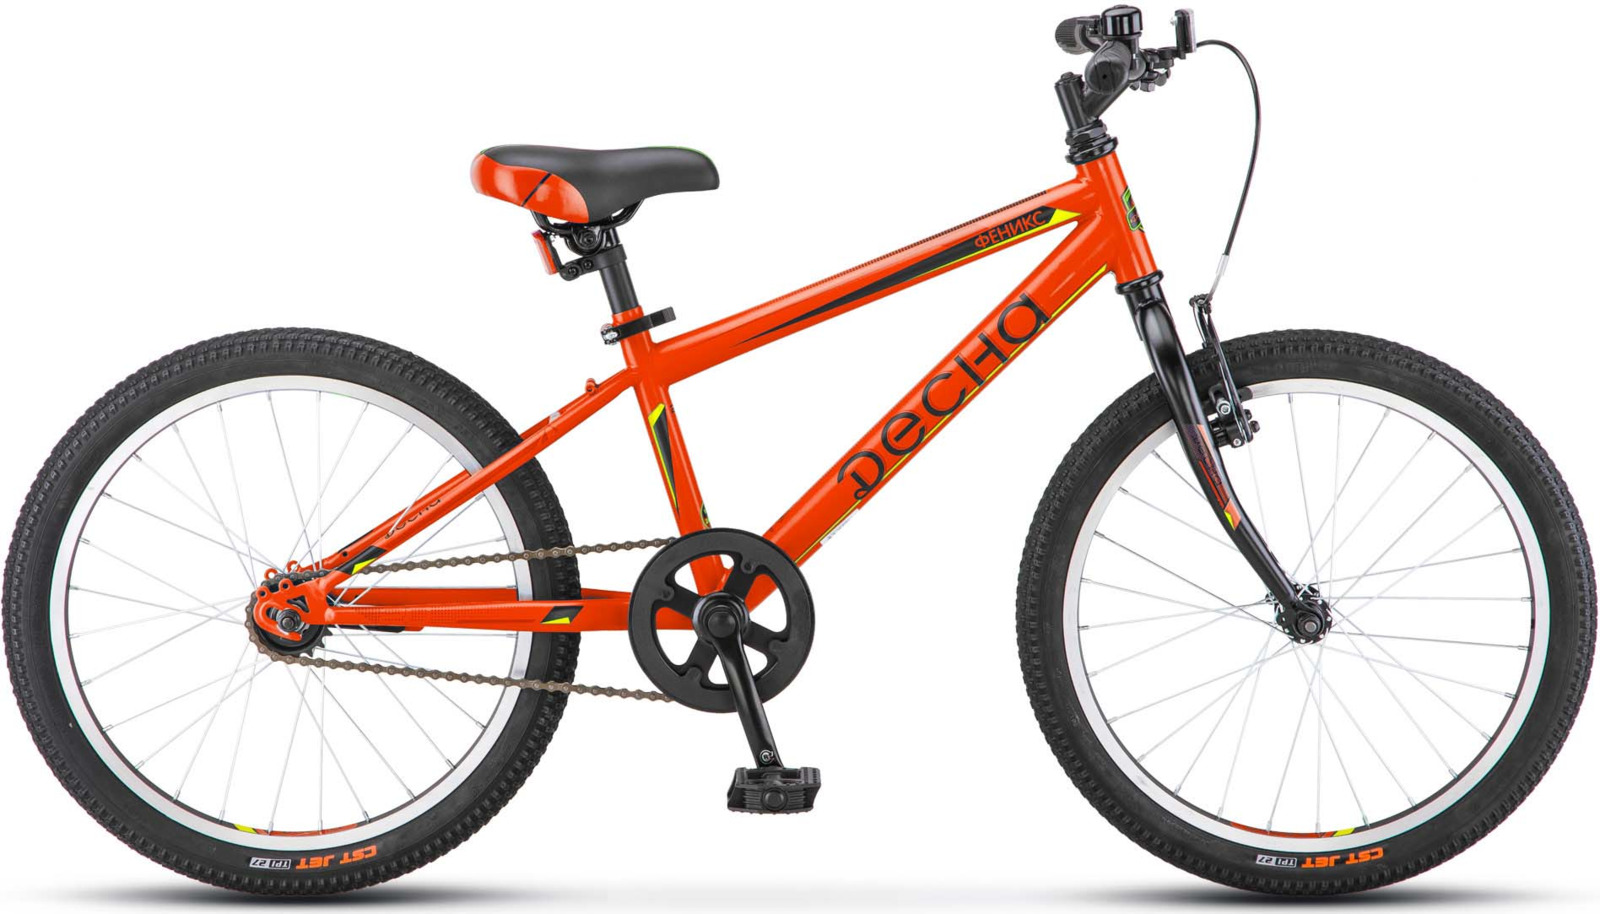 Велосипед Stels Десна Феникс 11, KUBC0045612017, оранжевый power tool accessories 7 9mm 3 1ratio dual wall adhesive lined waterproof heat shrink tubing excellent quality